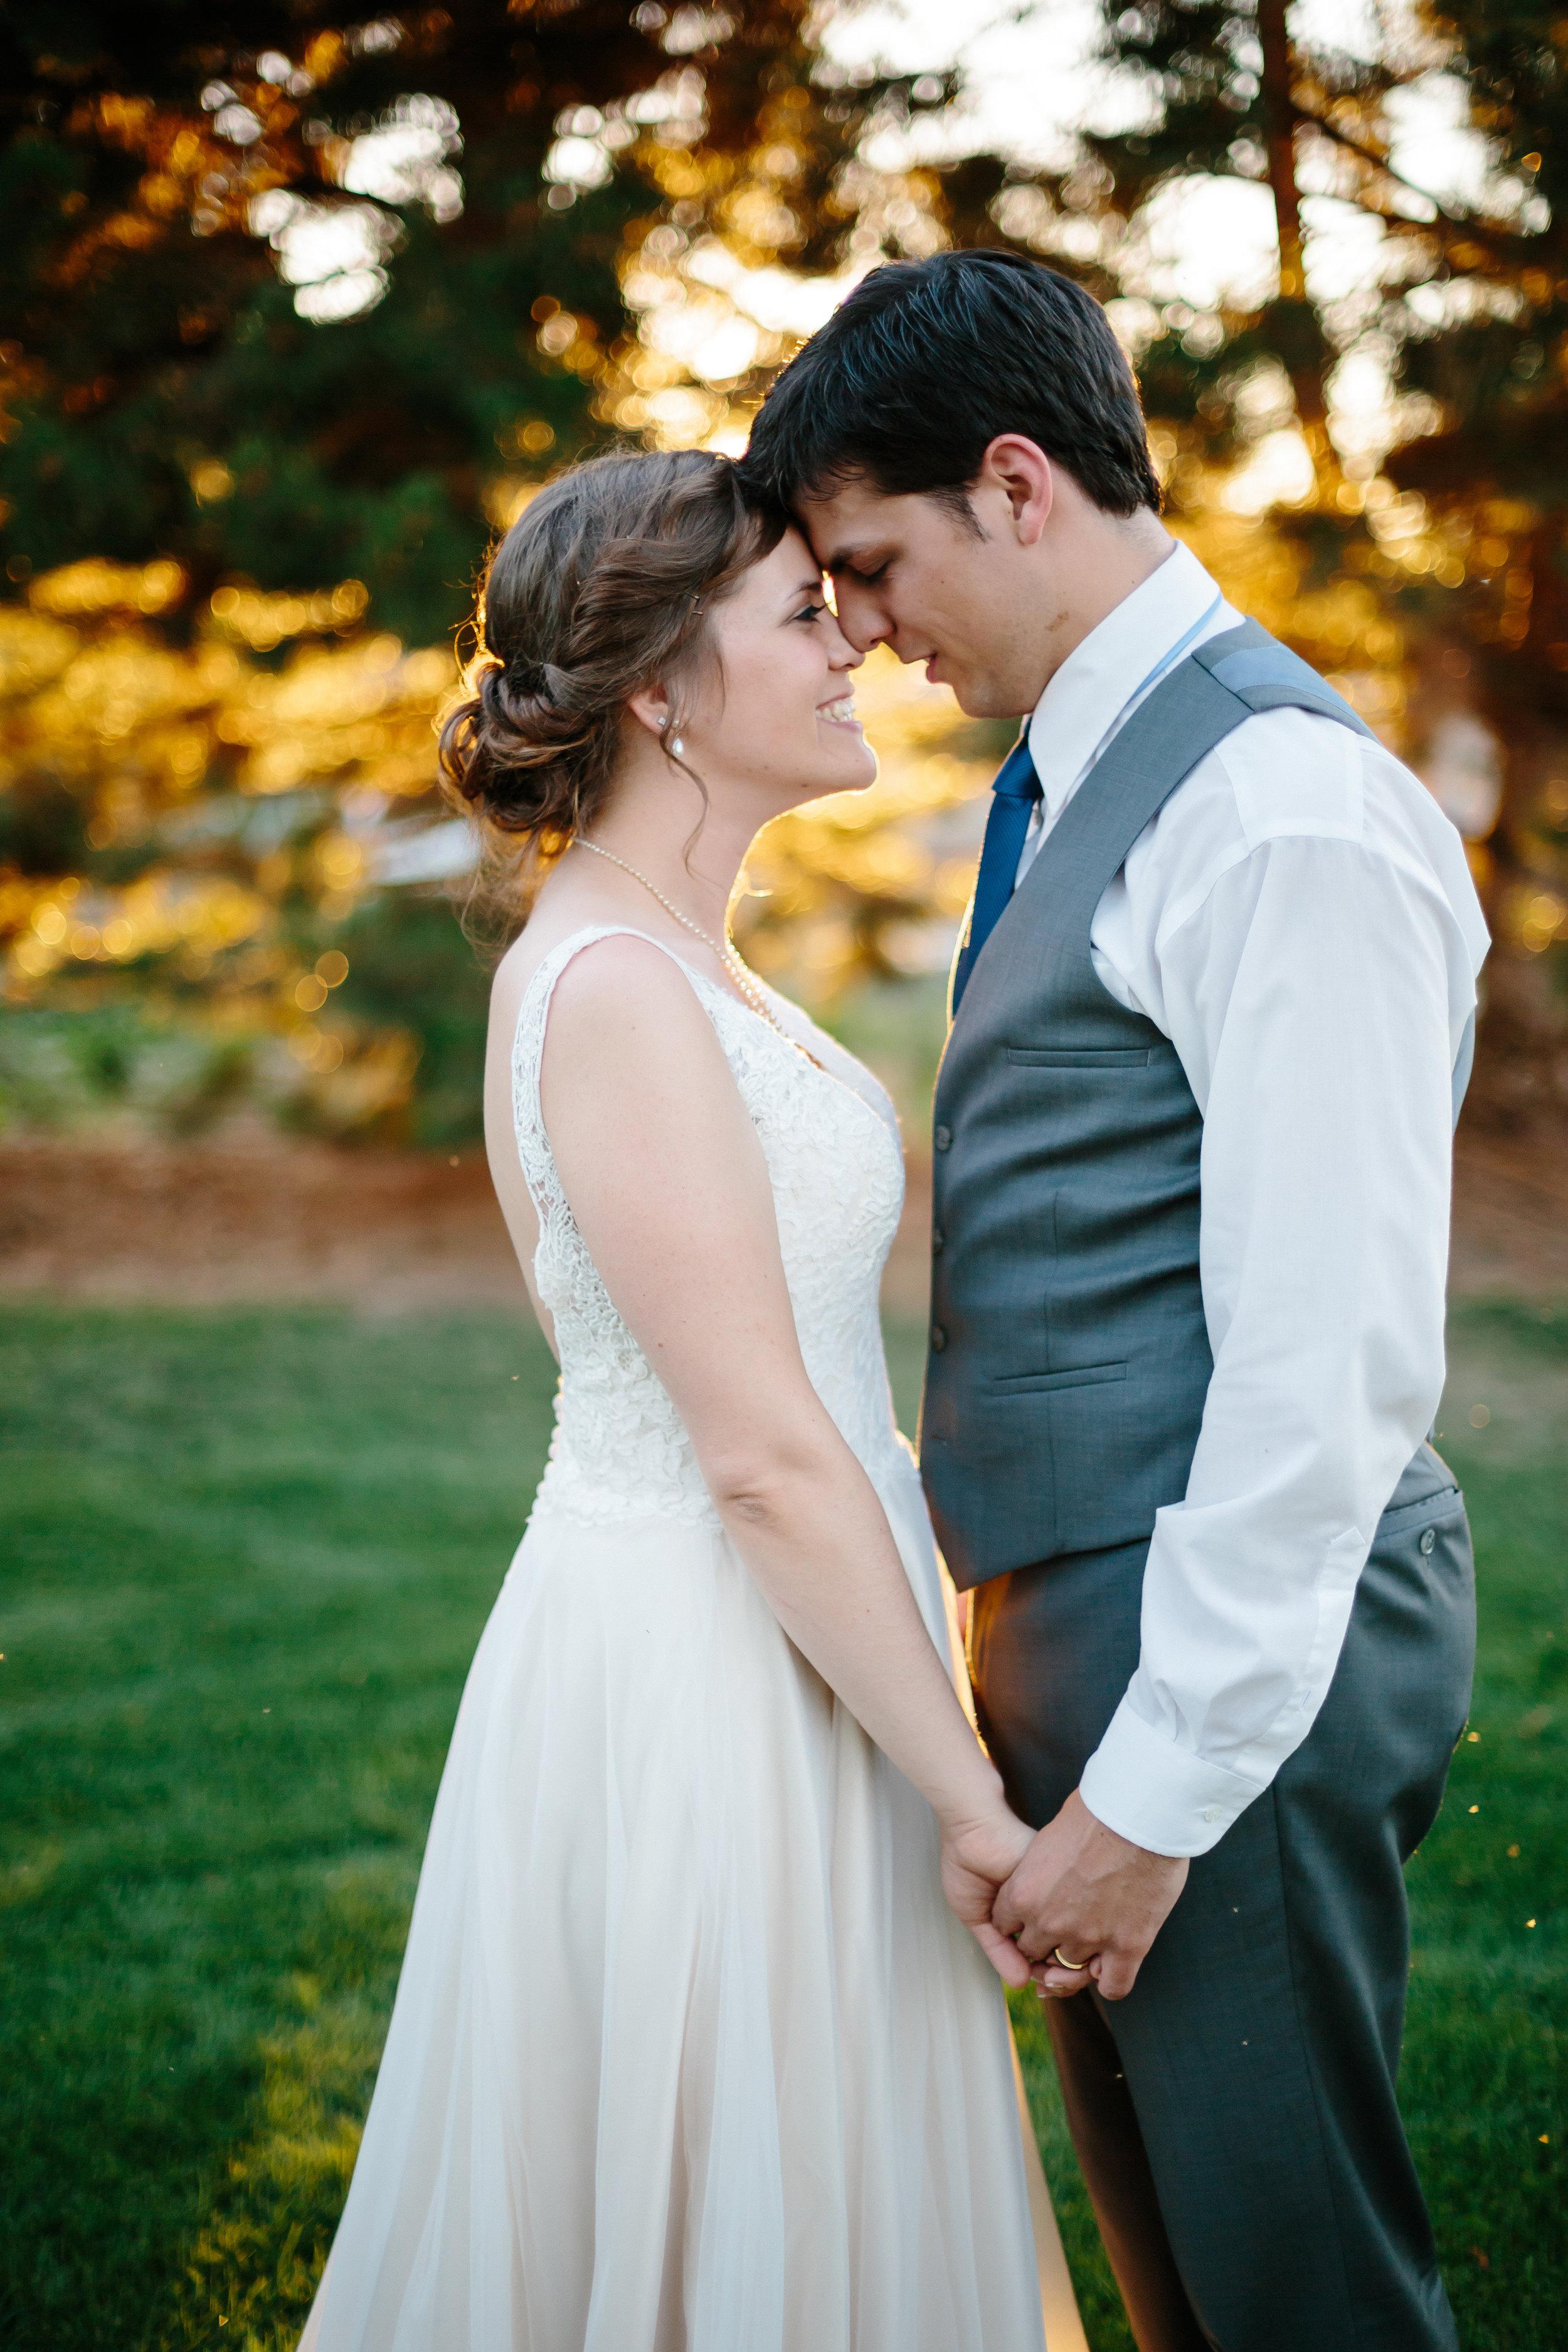 Jordan & Shantel Married - Idaho - Corrie Mick Photography-188.jpg